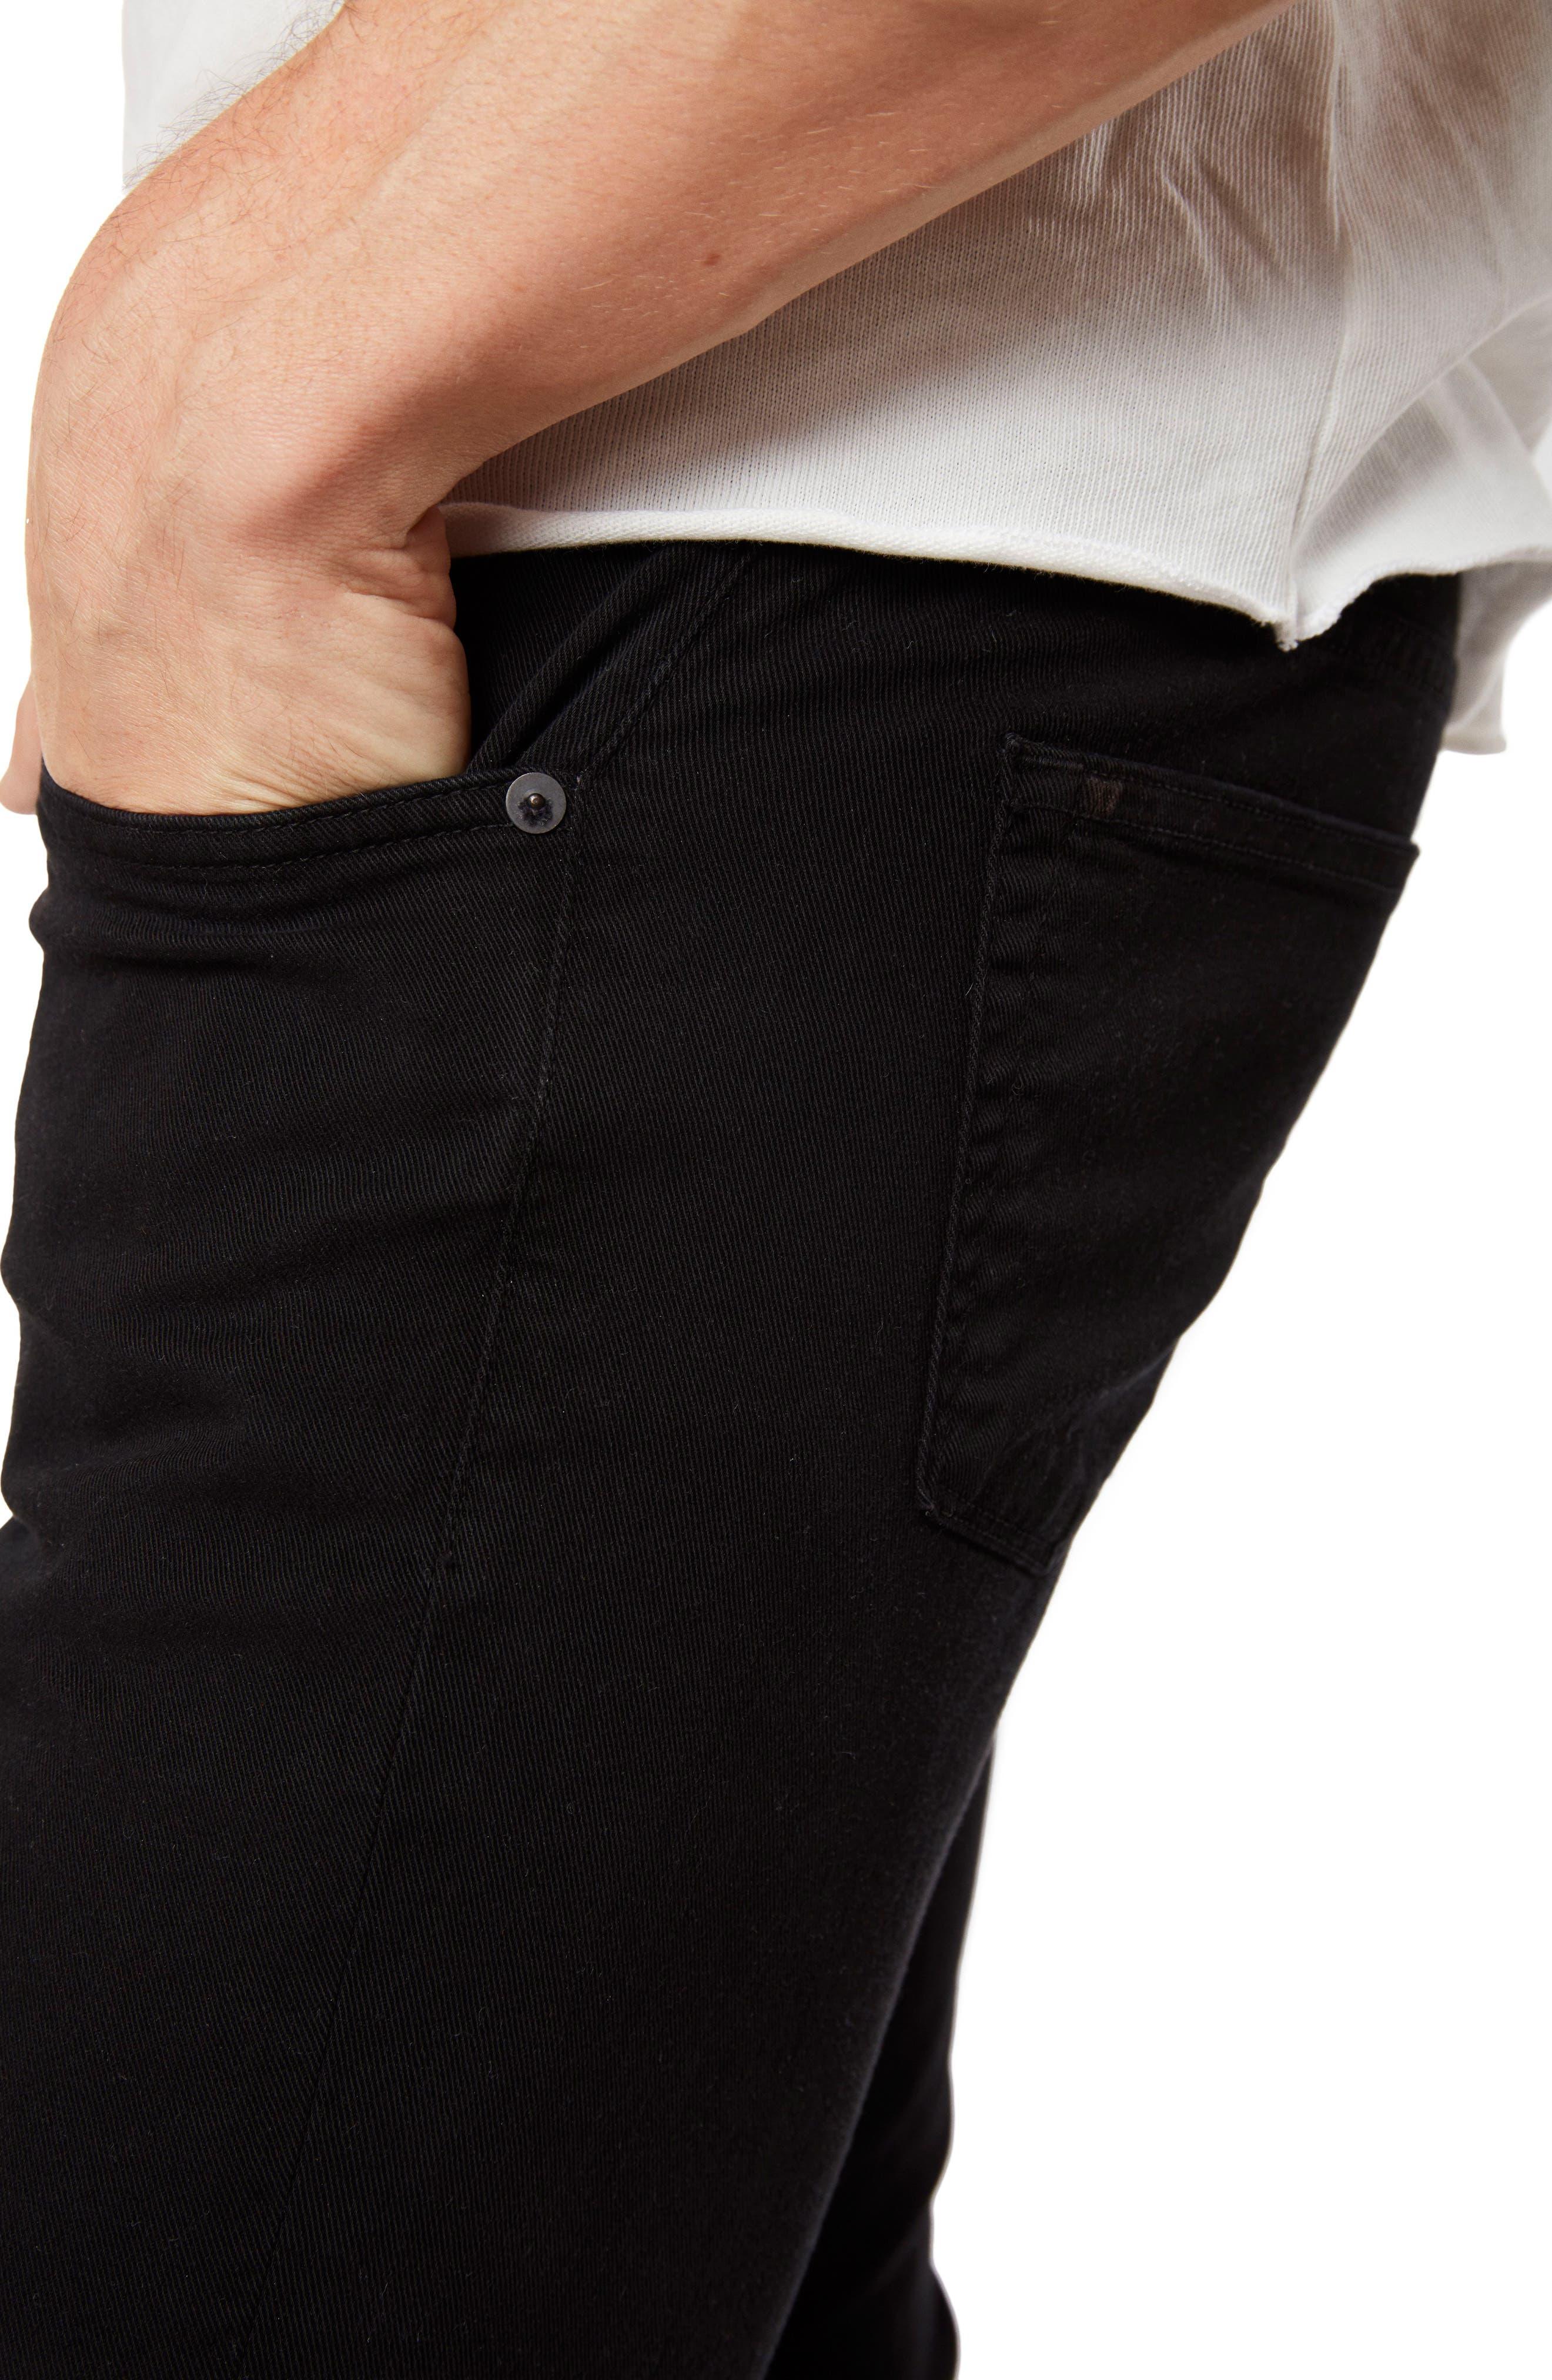 Mick Skinny Fit Jeans,                             Alternate thumbnail 5, color,                             LINCOLN OAK